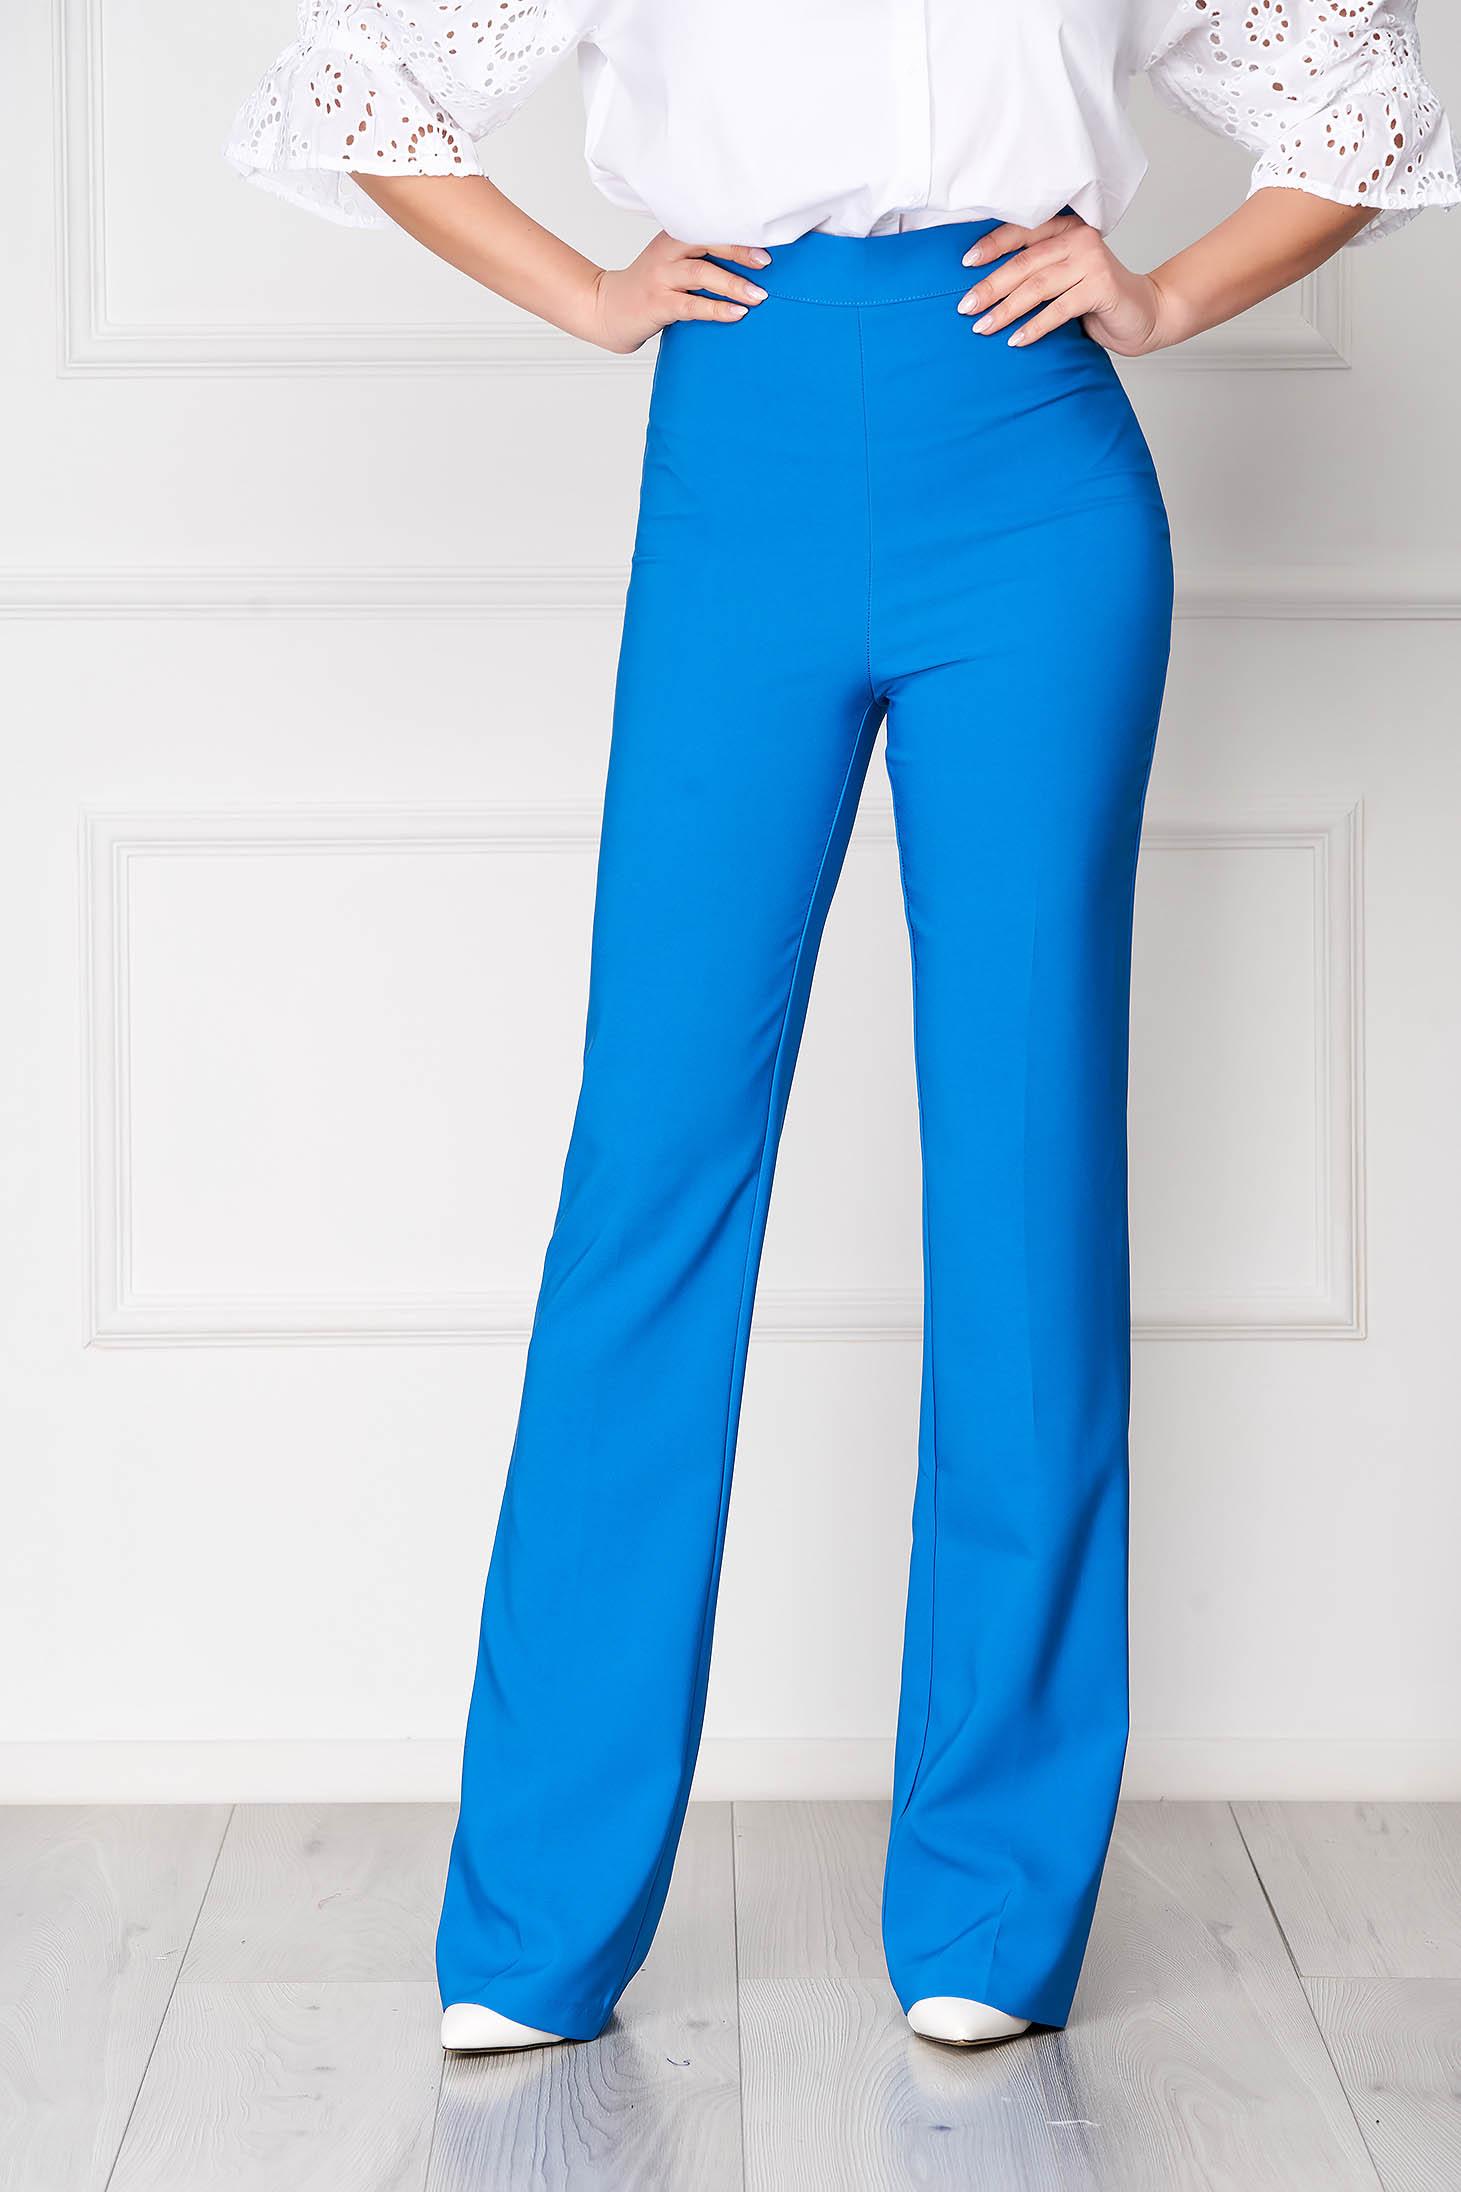 Blue trousers elegant long medium waist with easy cut